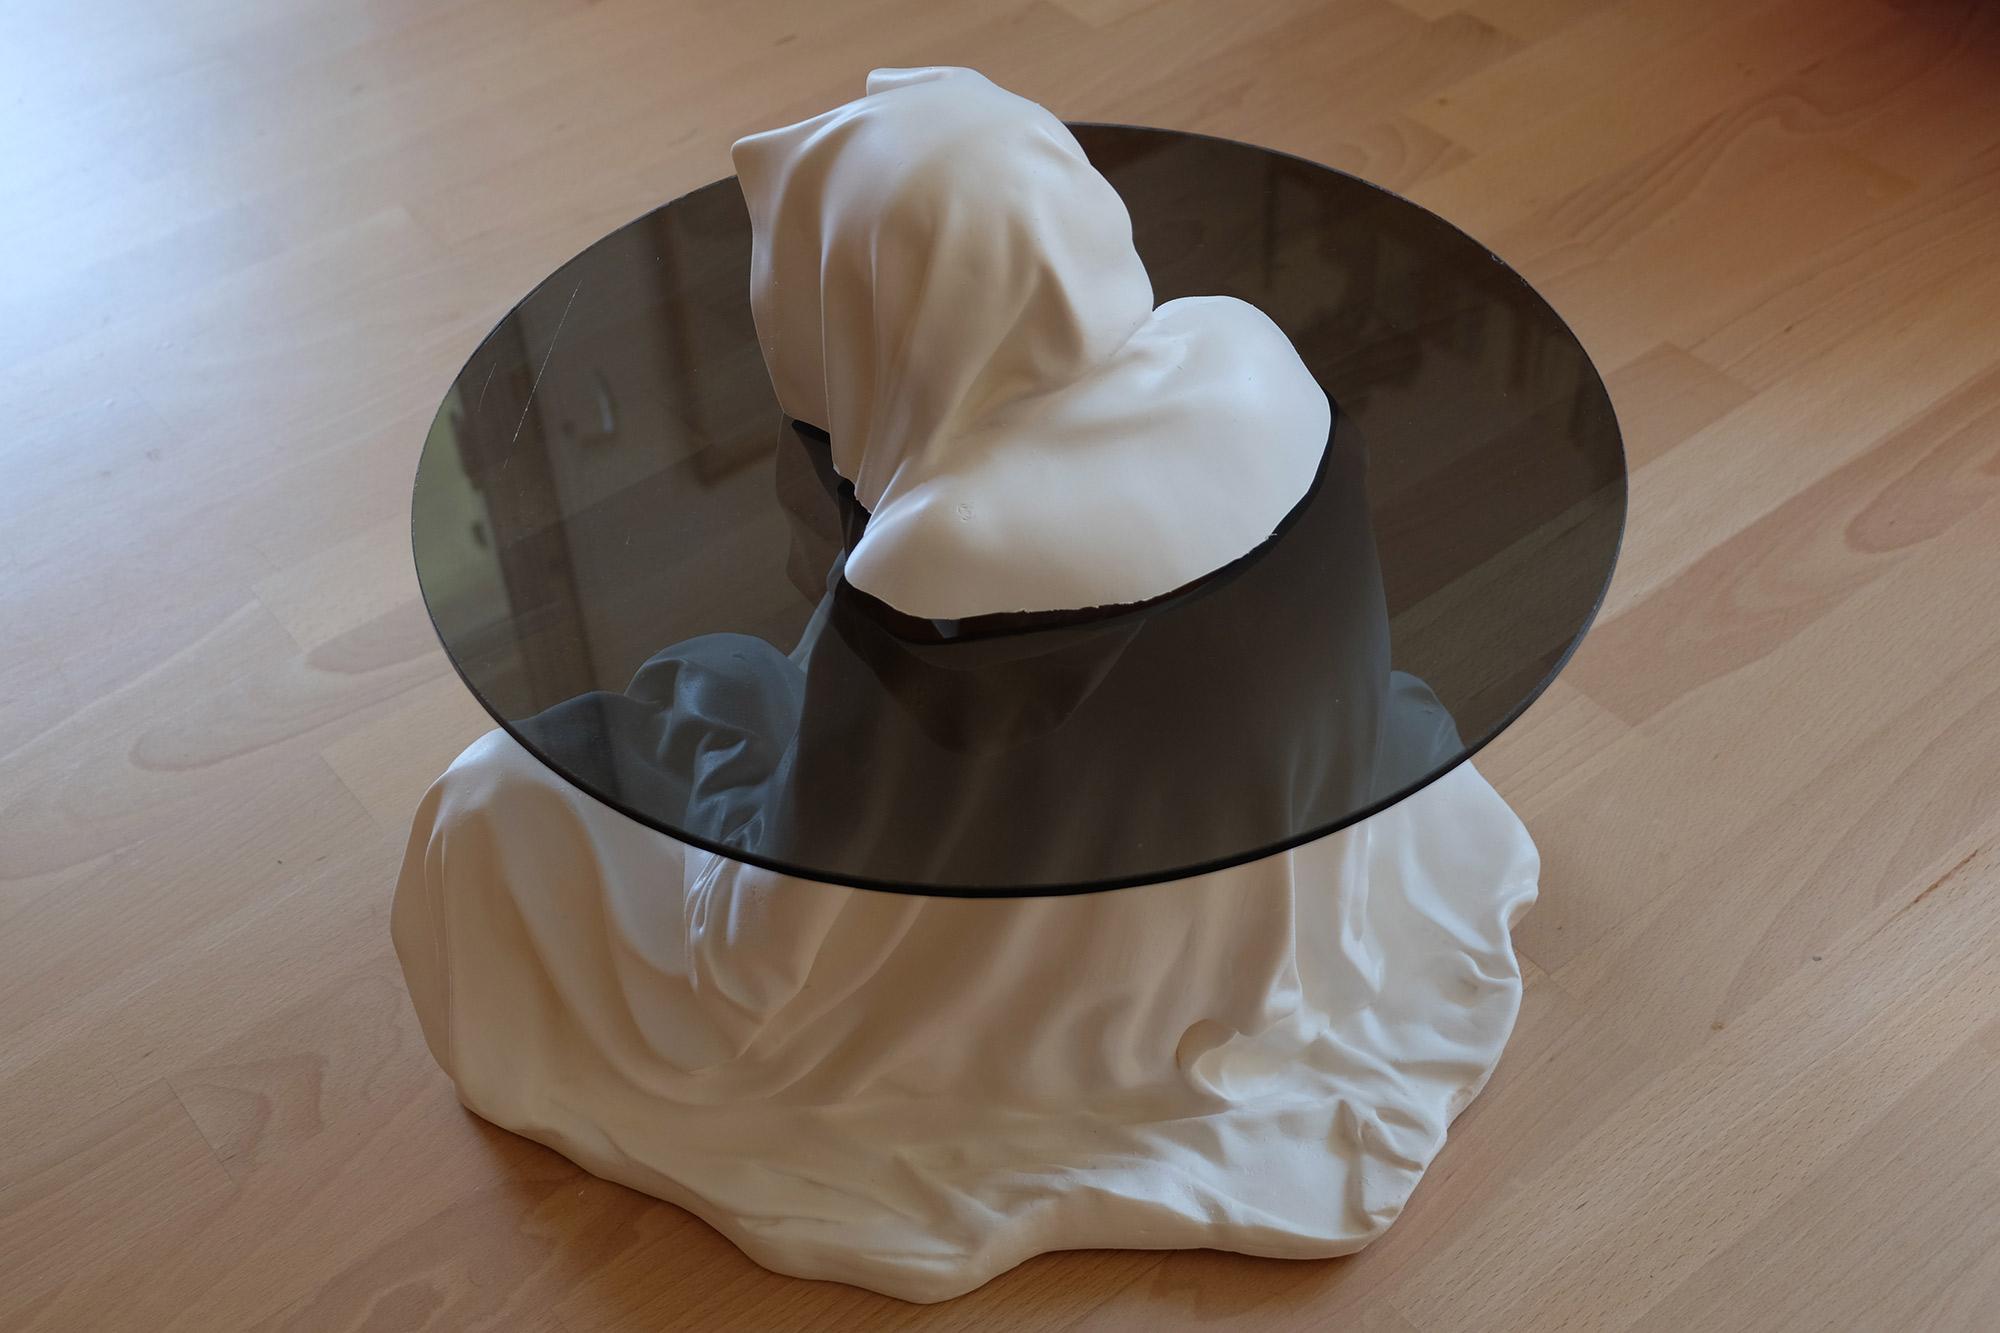 guardian-glass-tabel-furniture-modern-design-contemporary-art-arts-fineart-statue-sculpture-arte-manfred-kili-kielnhofer-7967